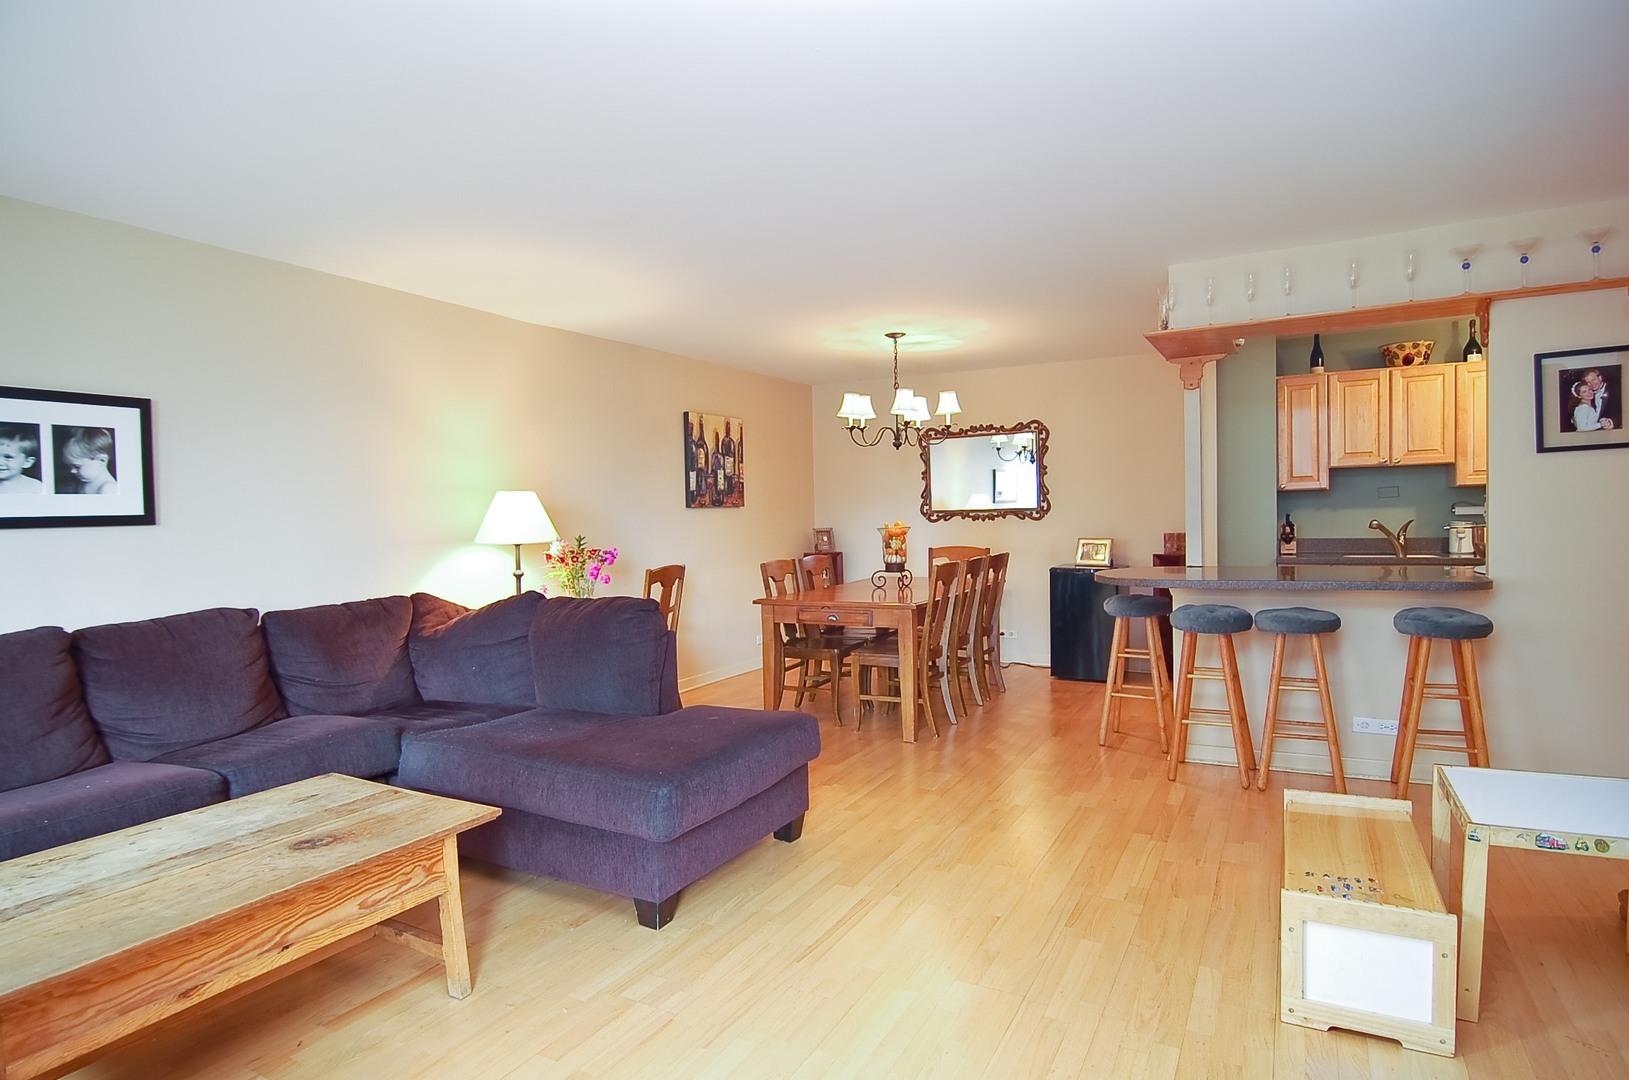 Hd 1497289706432 03 2626nlakeview unit301 165 livingroom hires